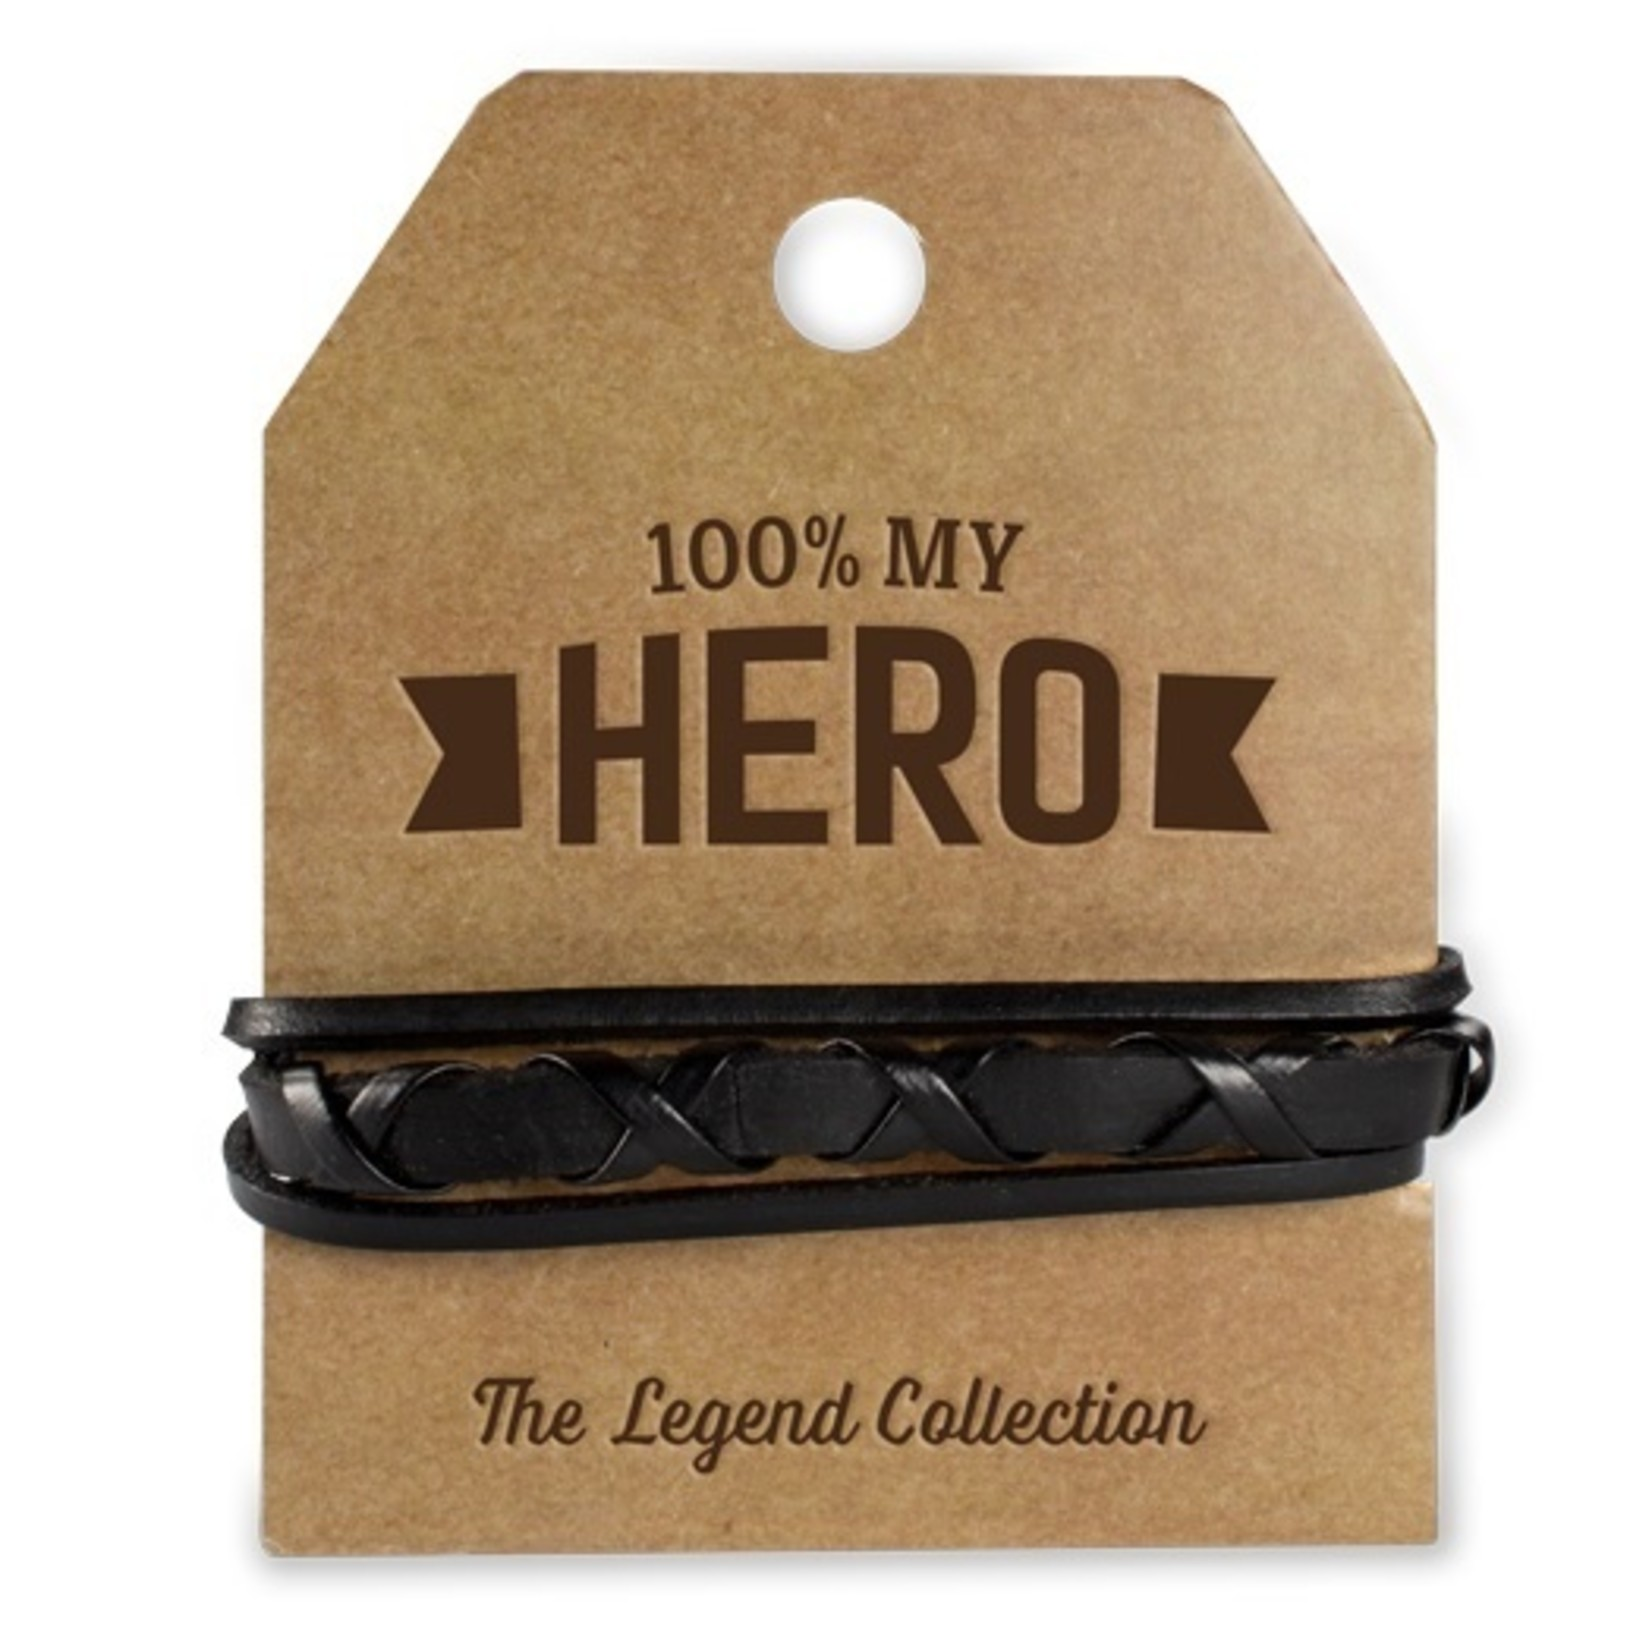 Miko Armband Legend 100% My hero